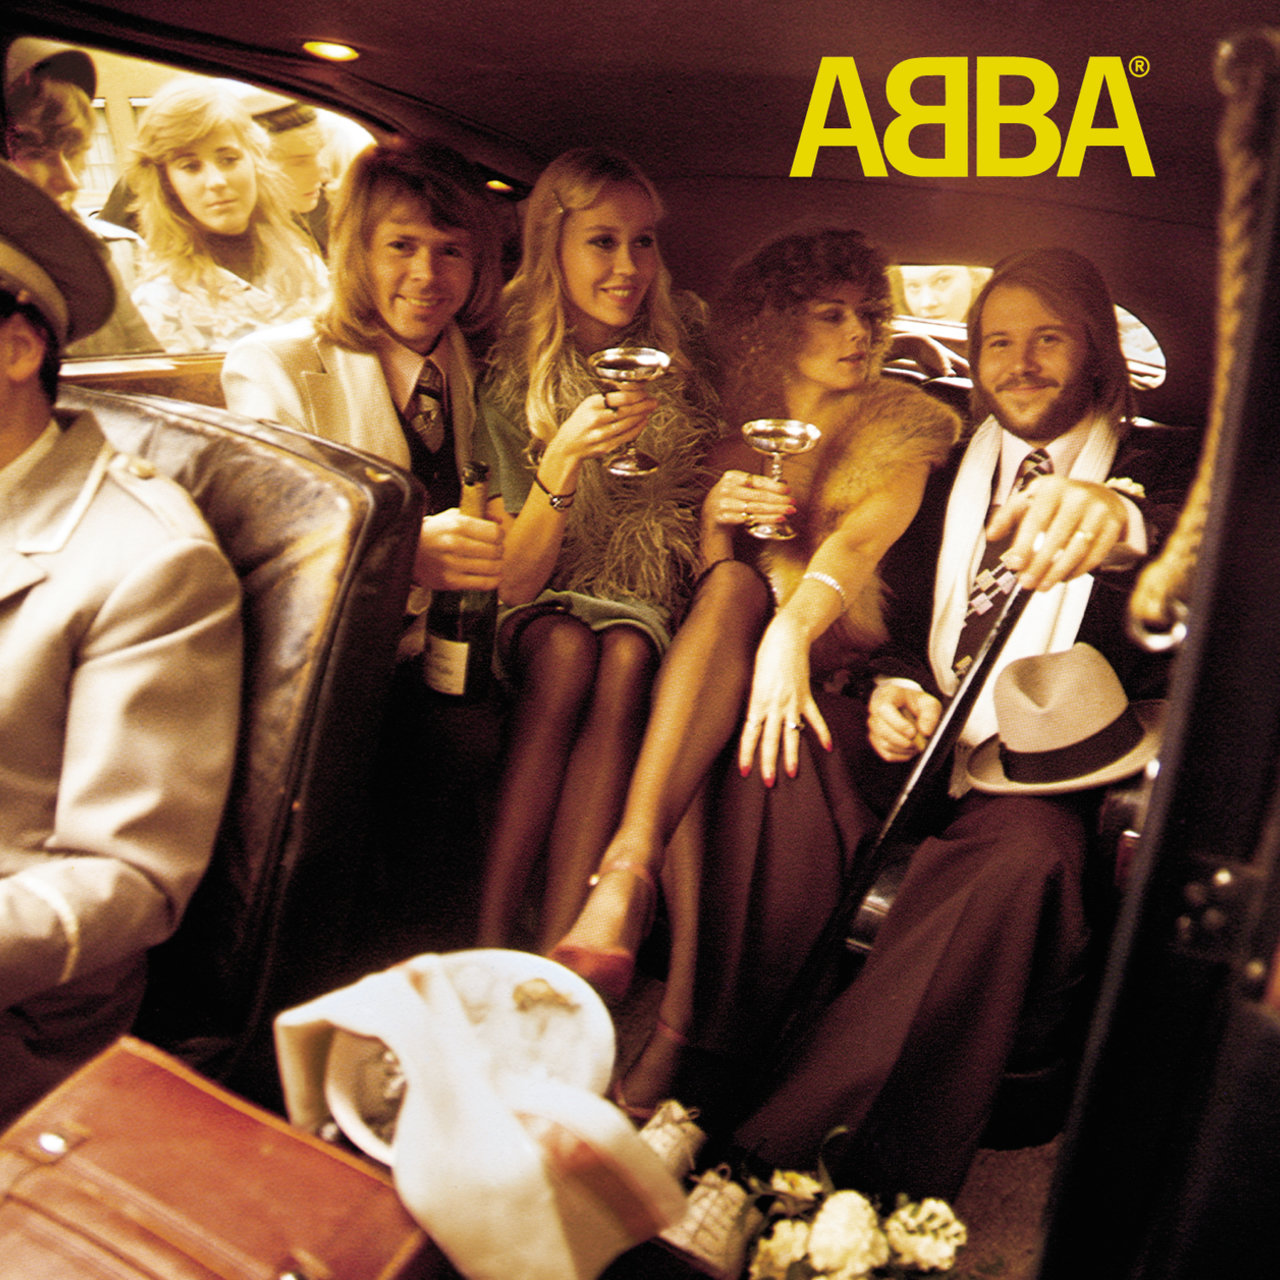 Abba - Waterloo - YouTube